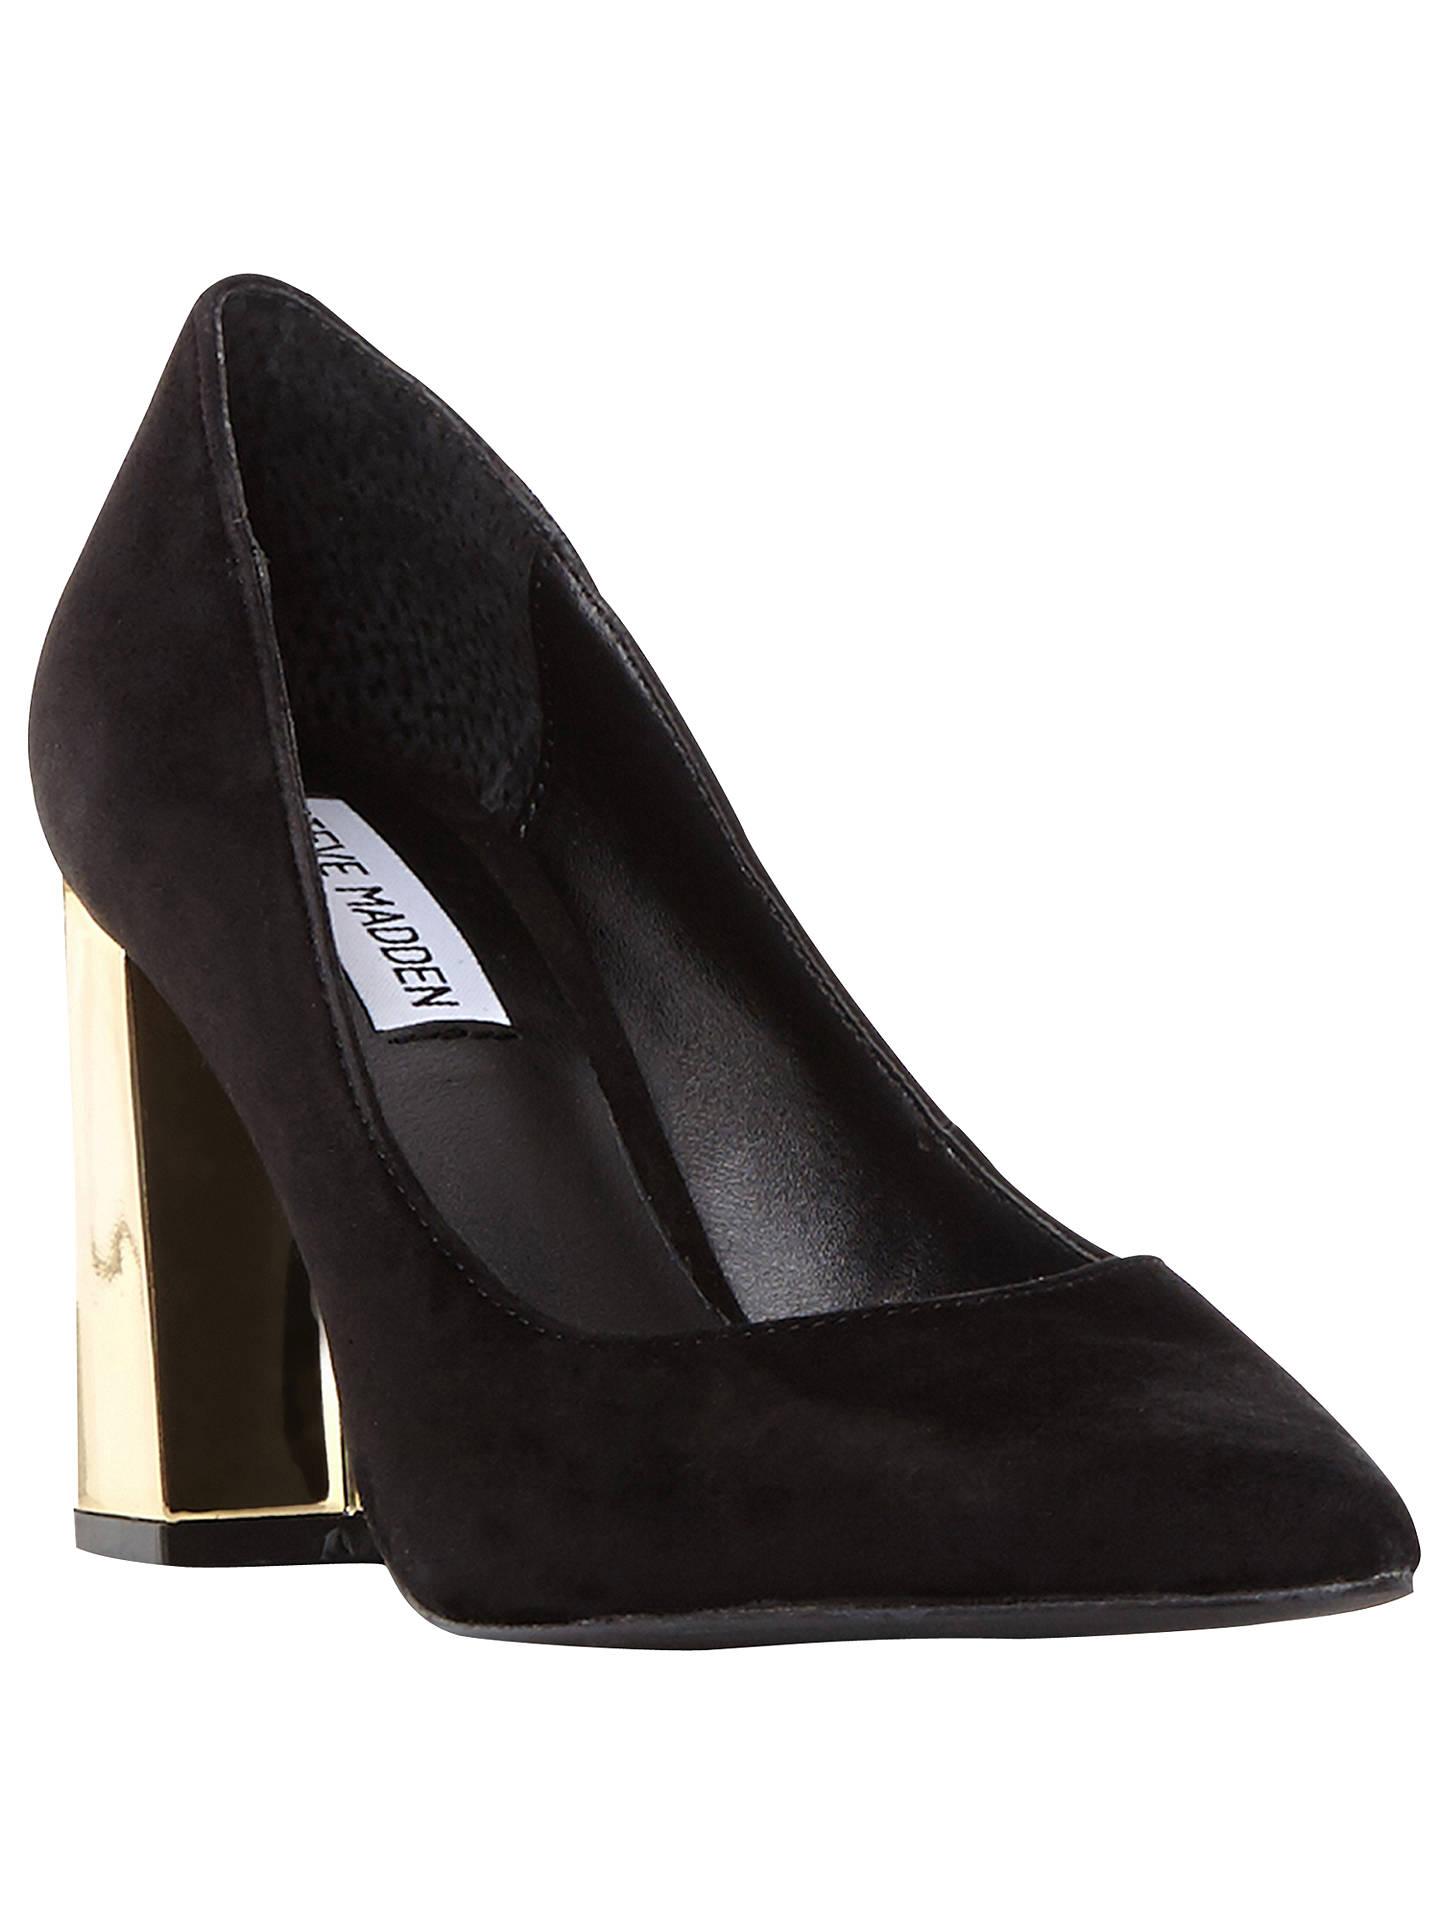 e34b310eb89 Steve Madden Pointur Block Heeled Court Shoes, Black at John Lewis ...